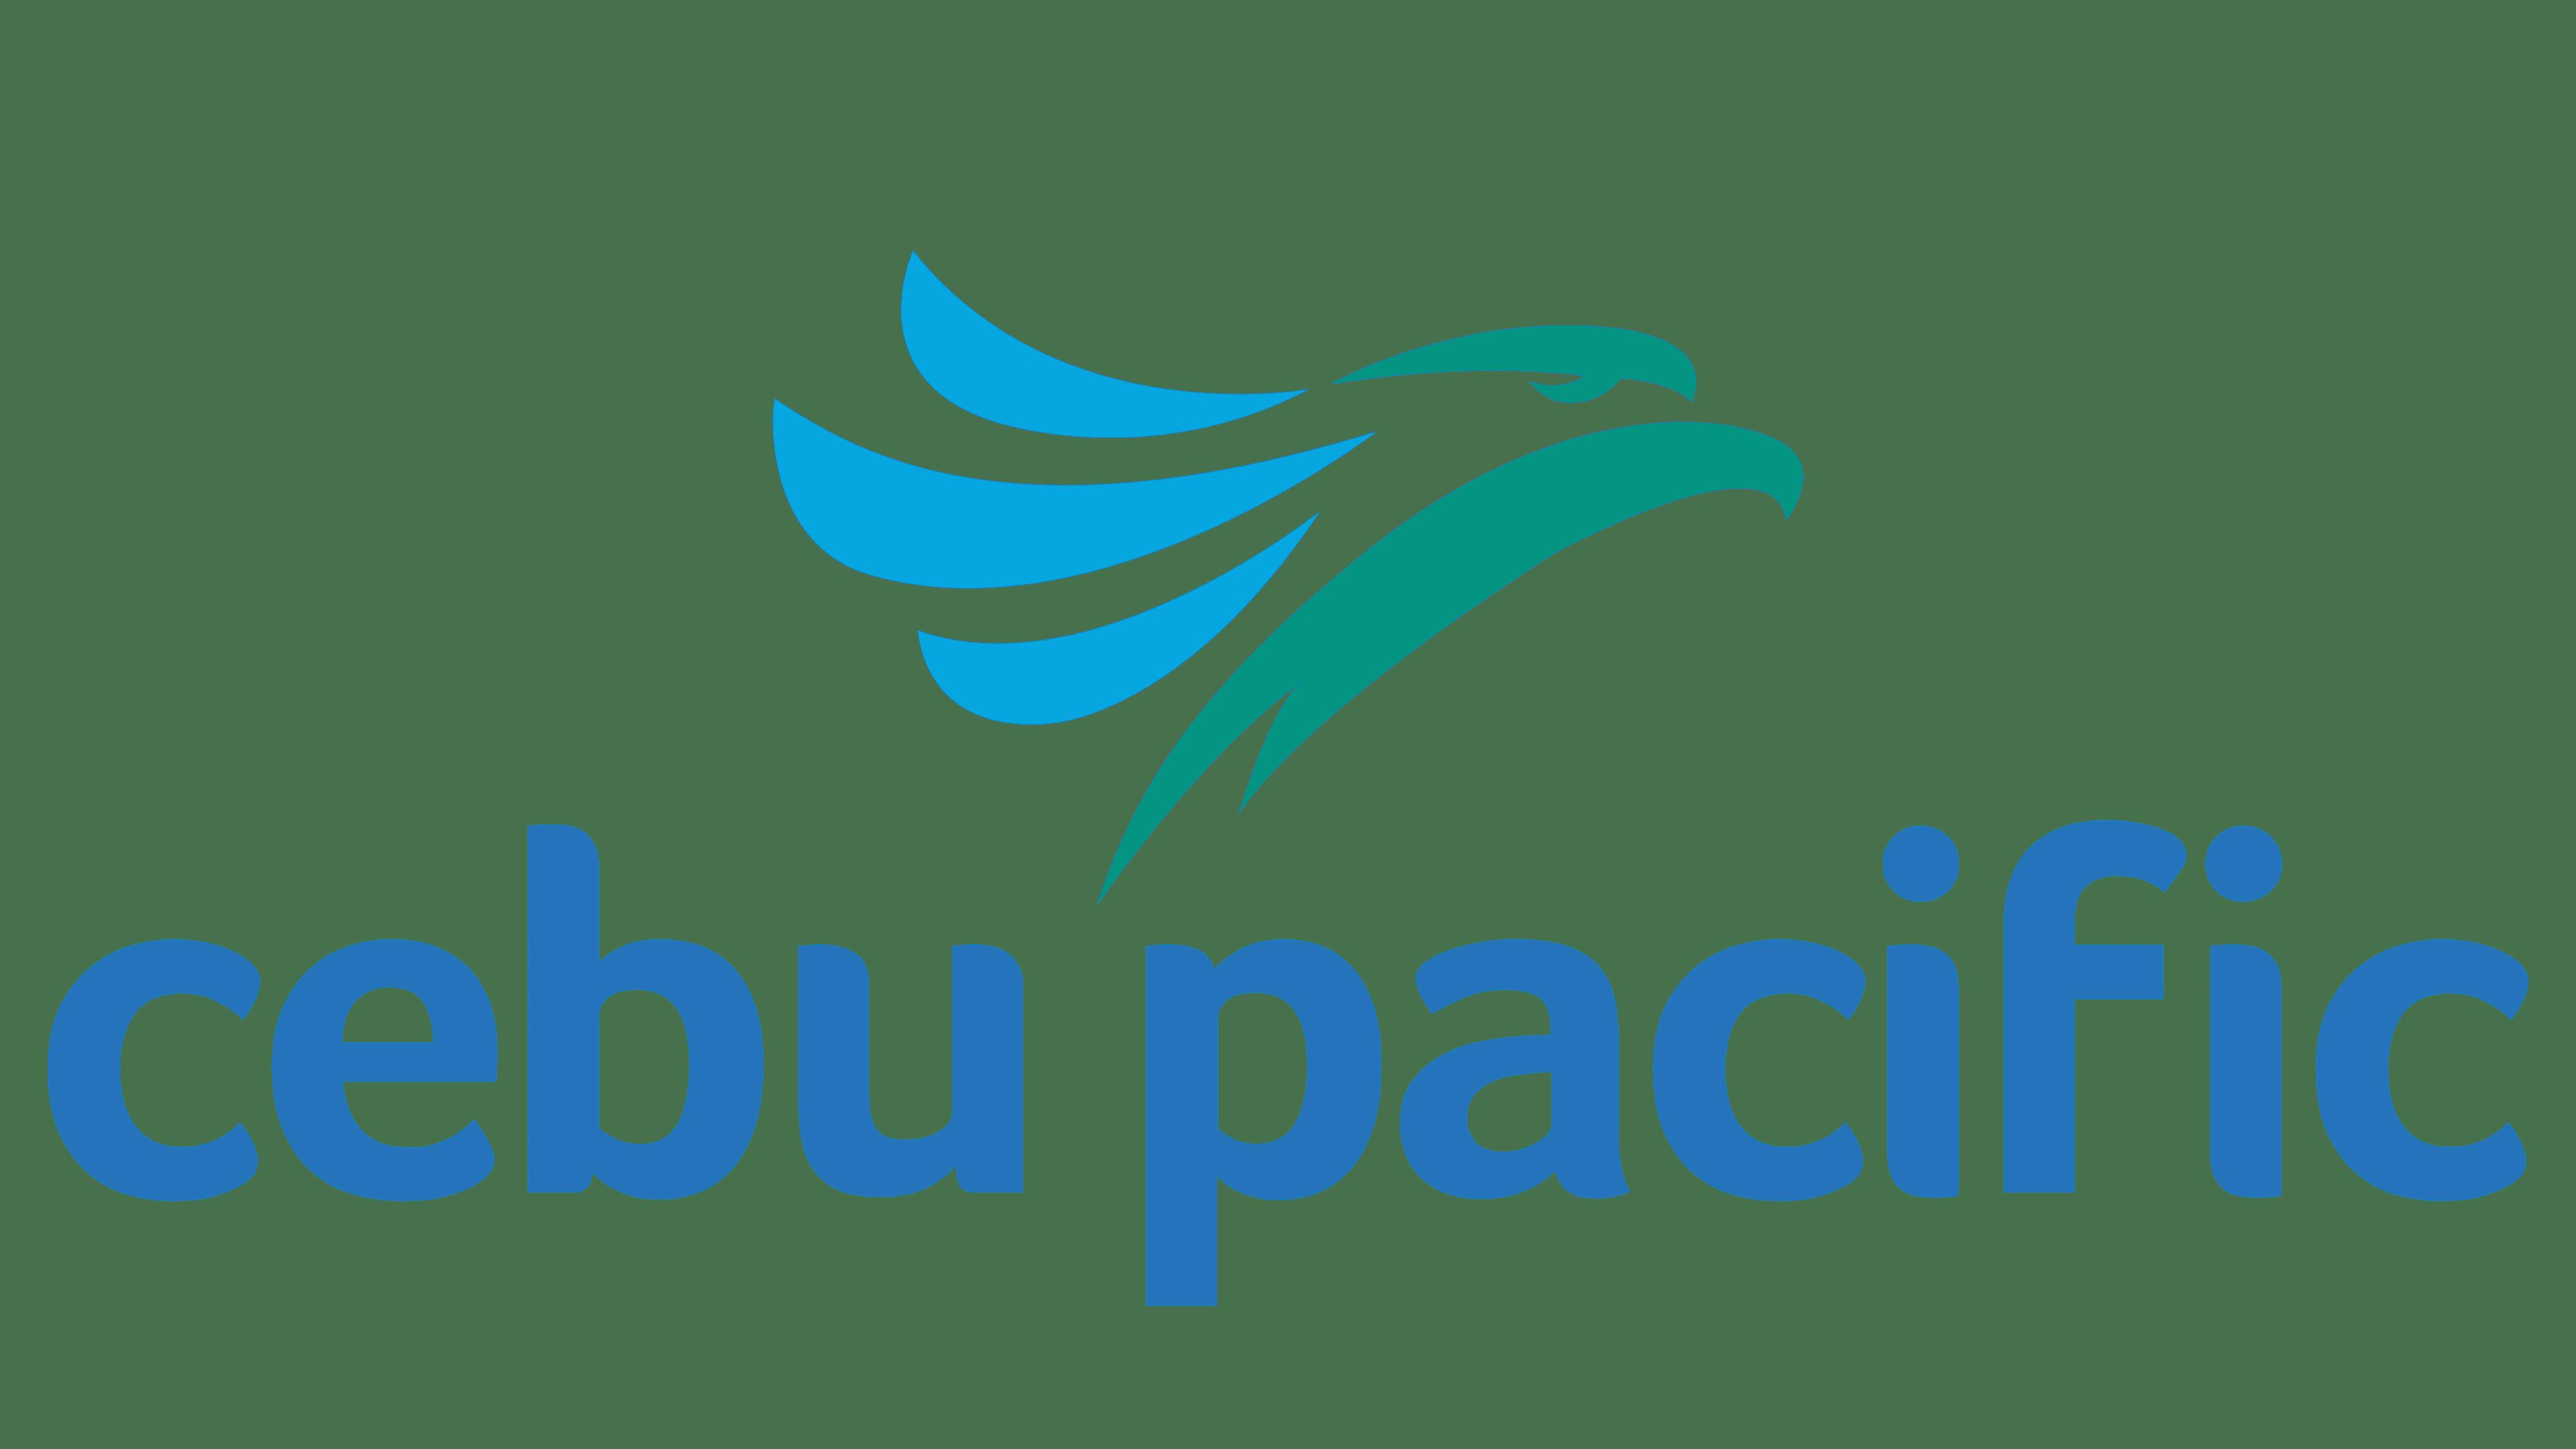 Cebu Pacific Logo Logo